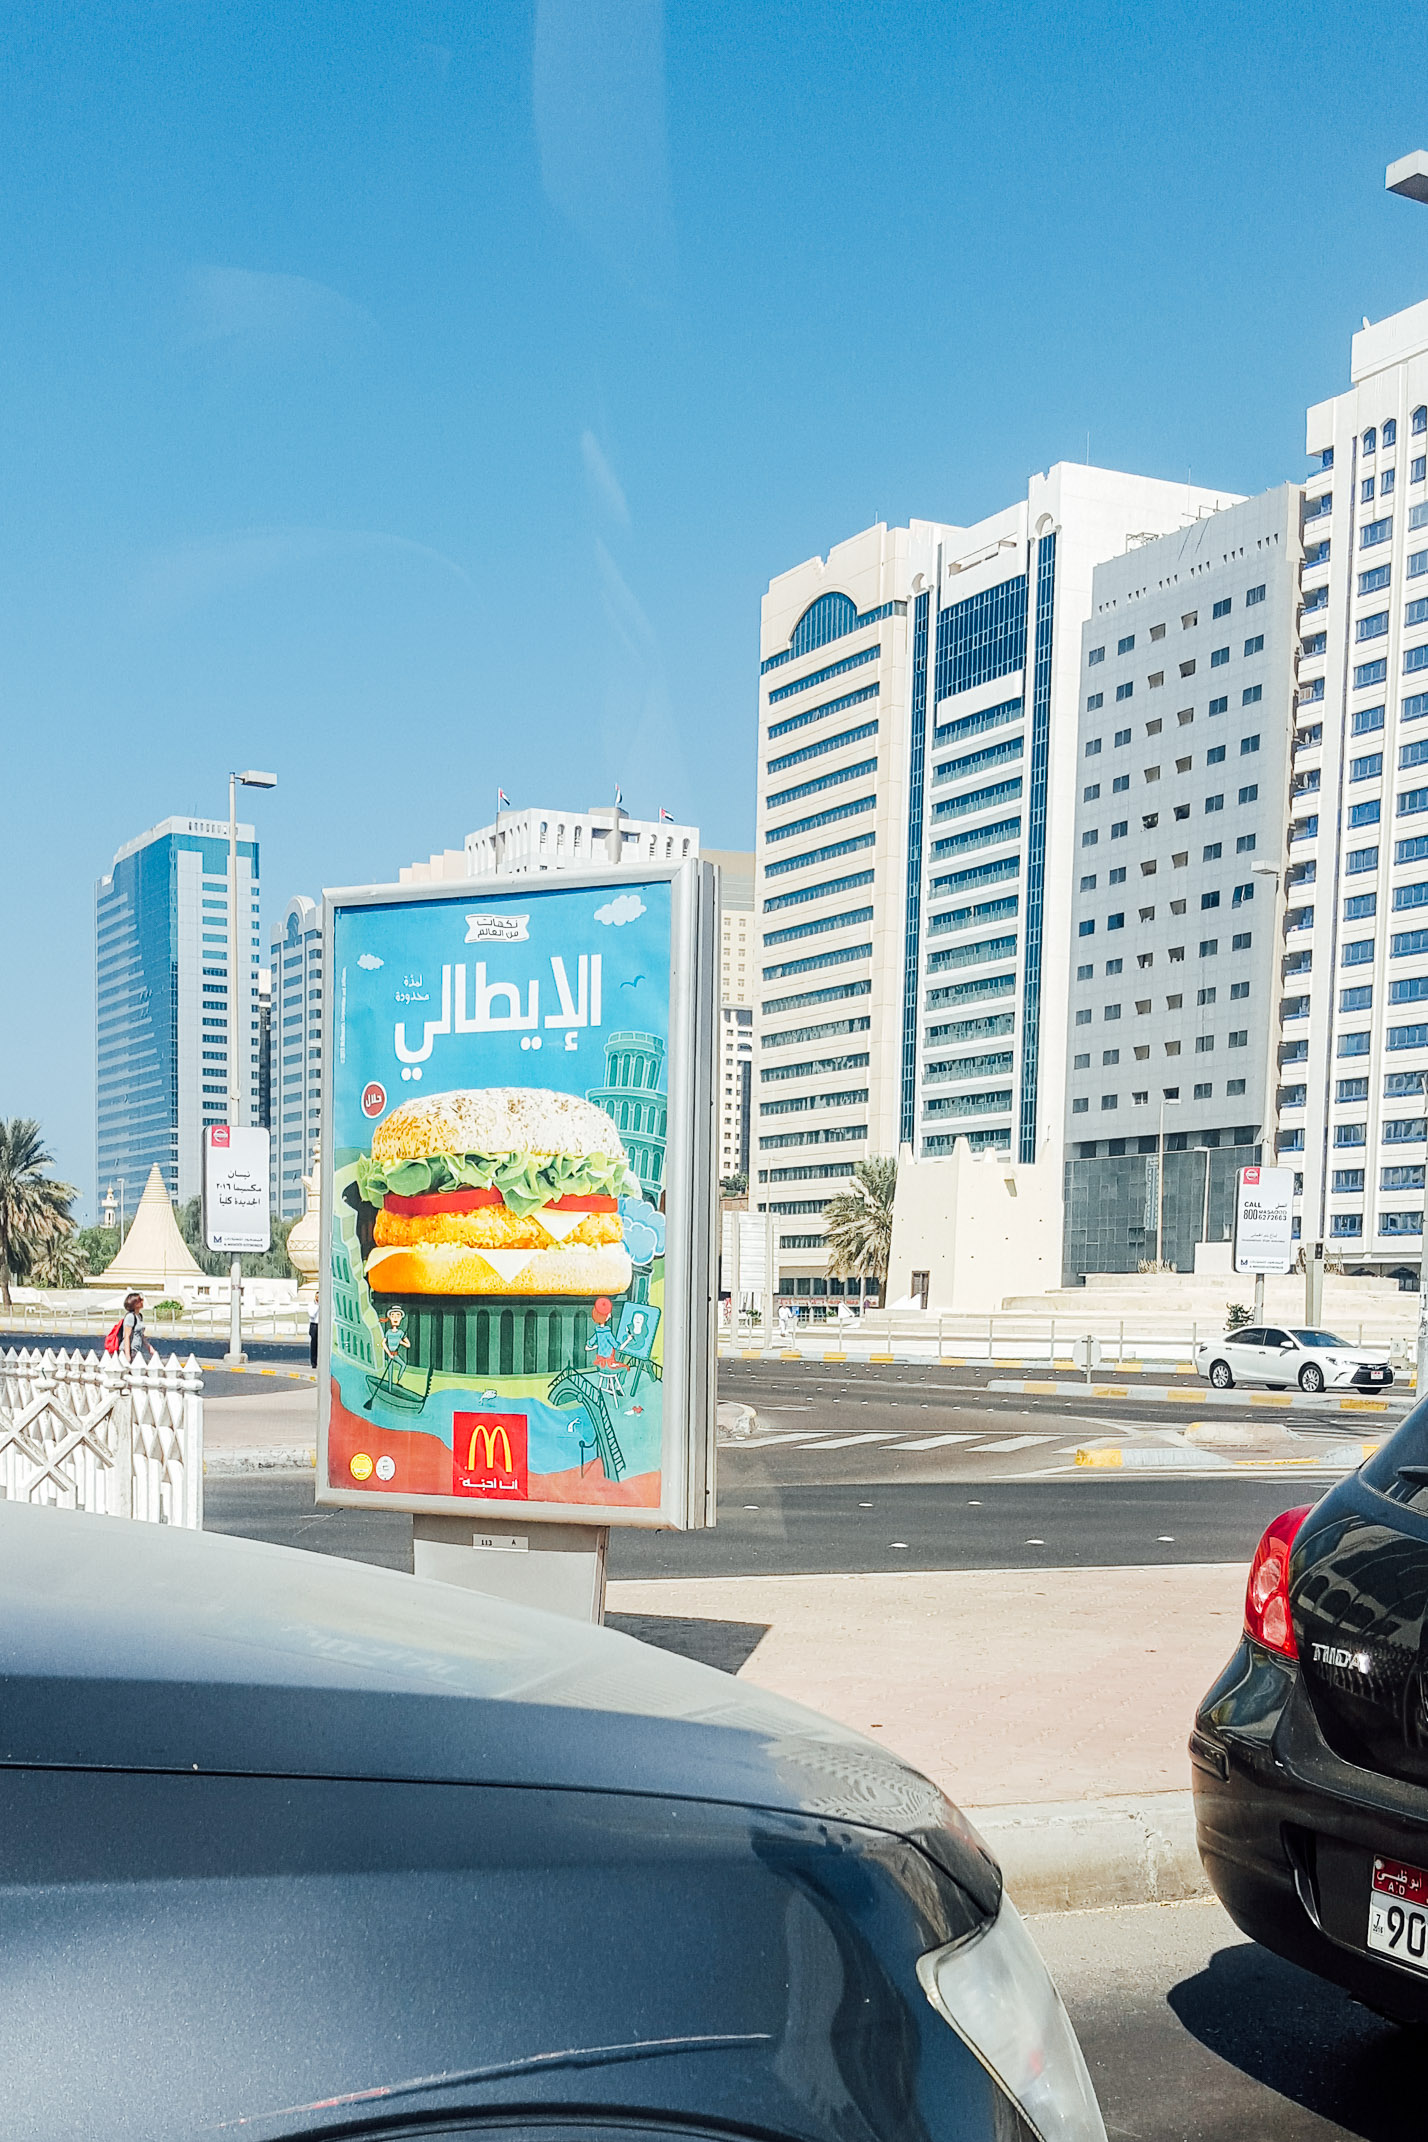 Abu Dhabi through the lens of the Samsung Galaxy S6 edge   Love Daily Dose